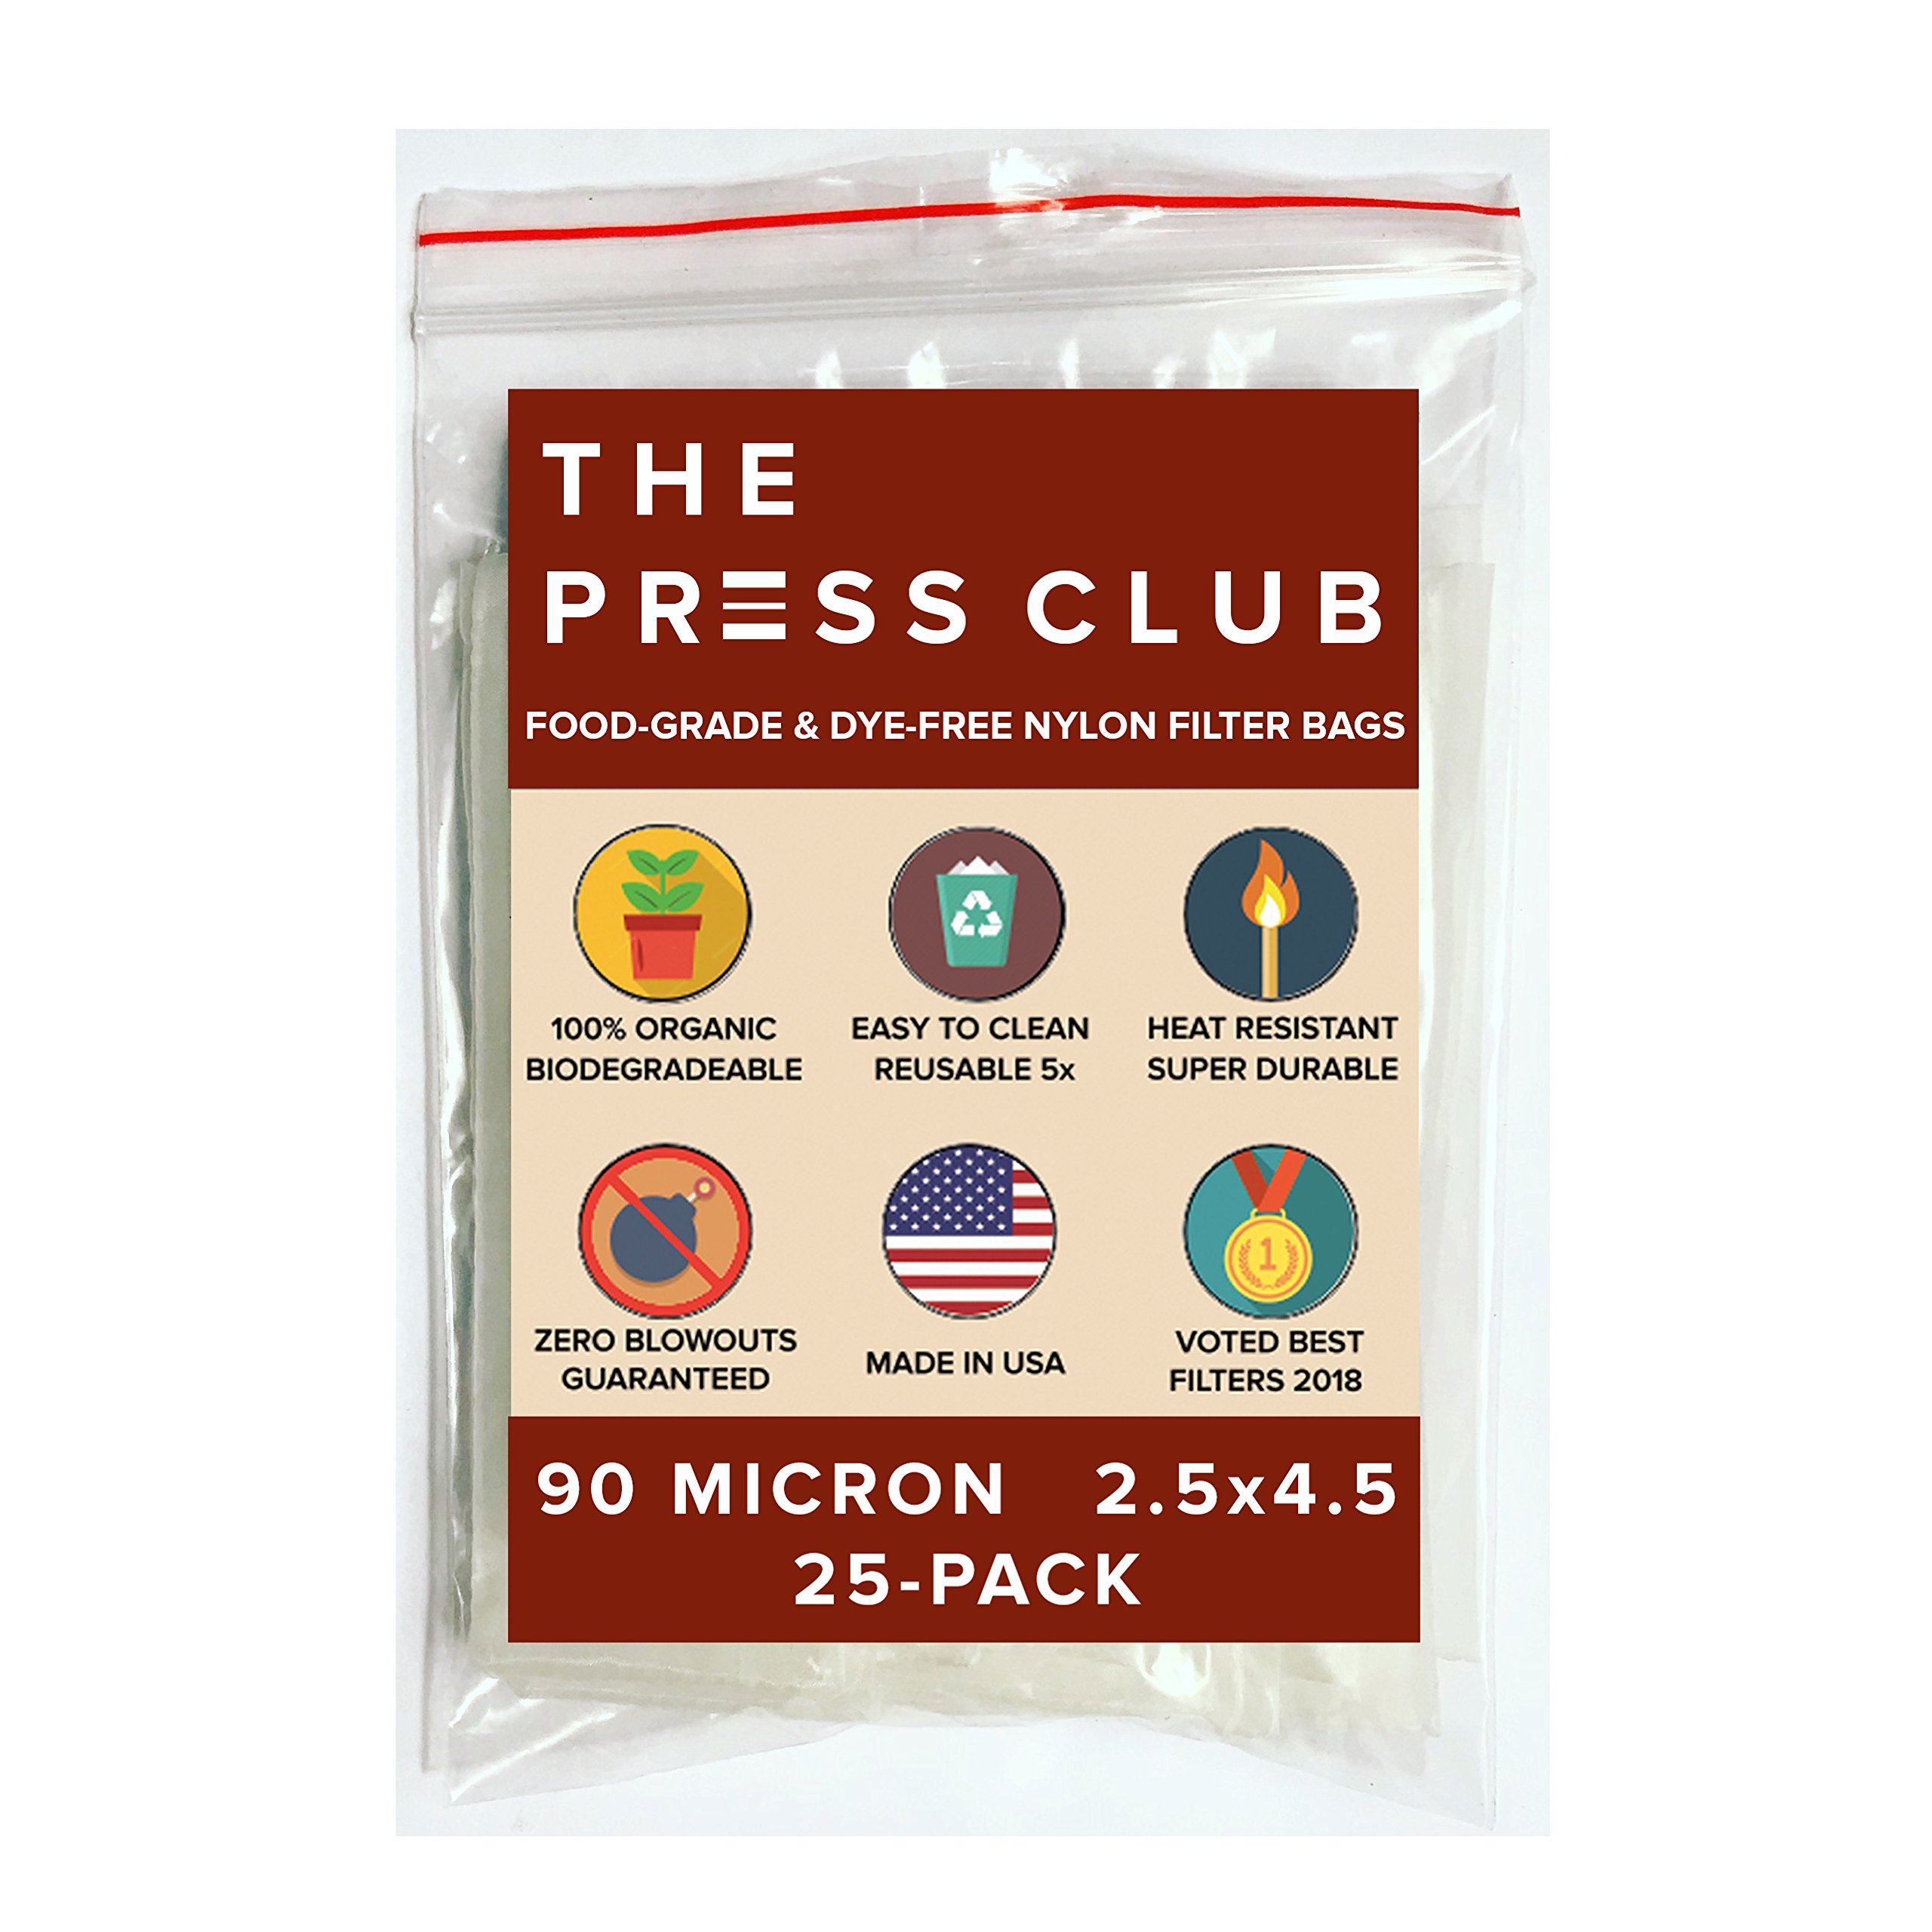 90 Micron | Premium Nylon Tea Filter Press Screen Bags | 2.5'' x 4.5'' | 25 Pack | Zero Blowout Guarantee | All Micron & Sizes Available